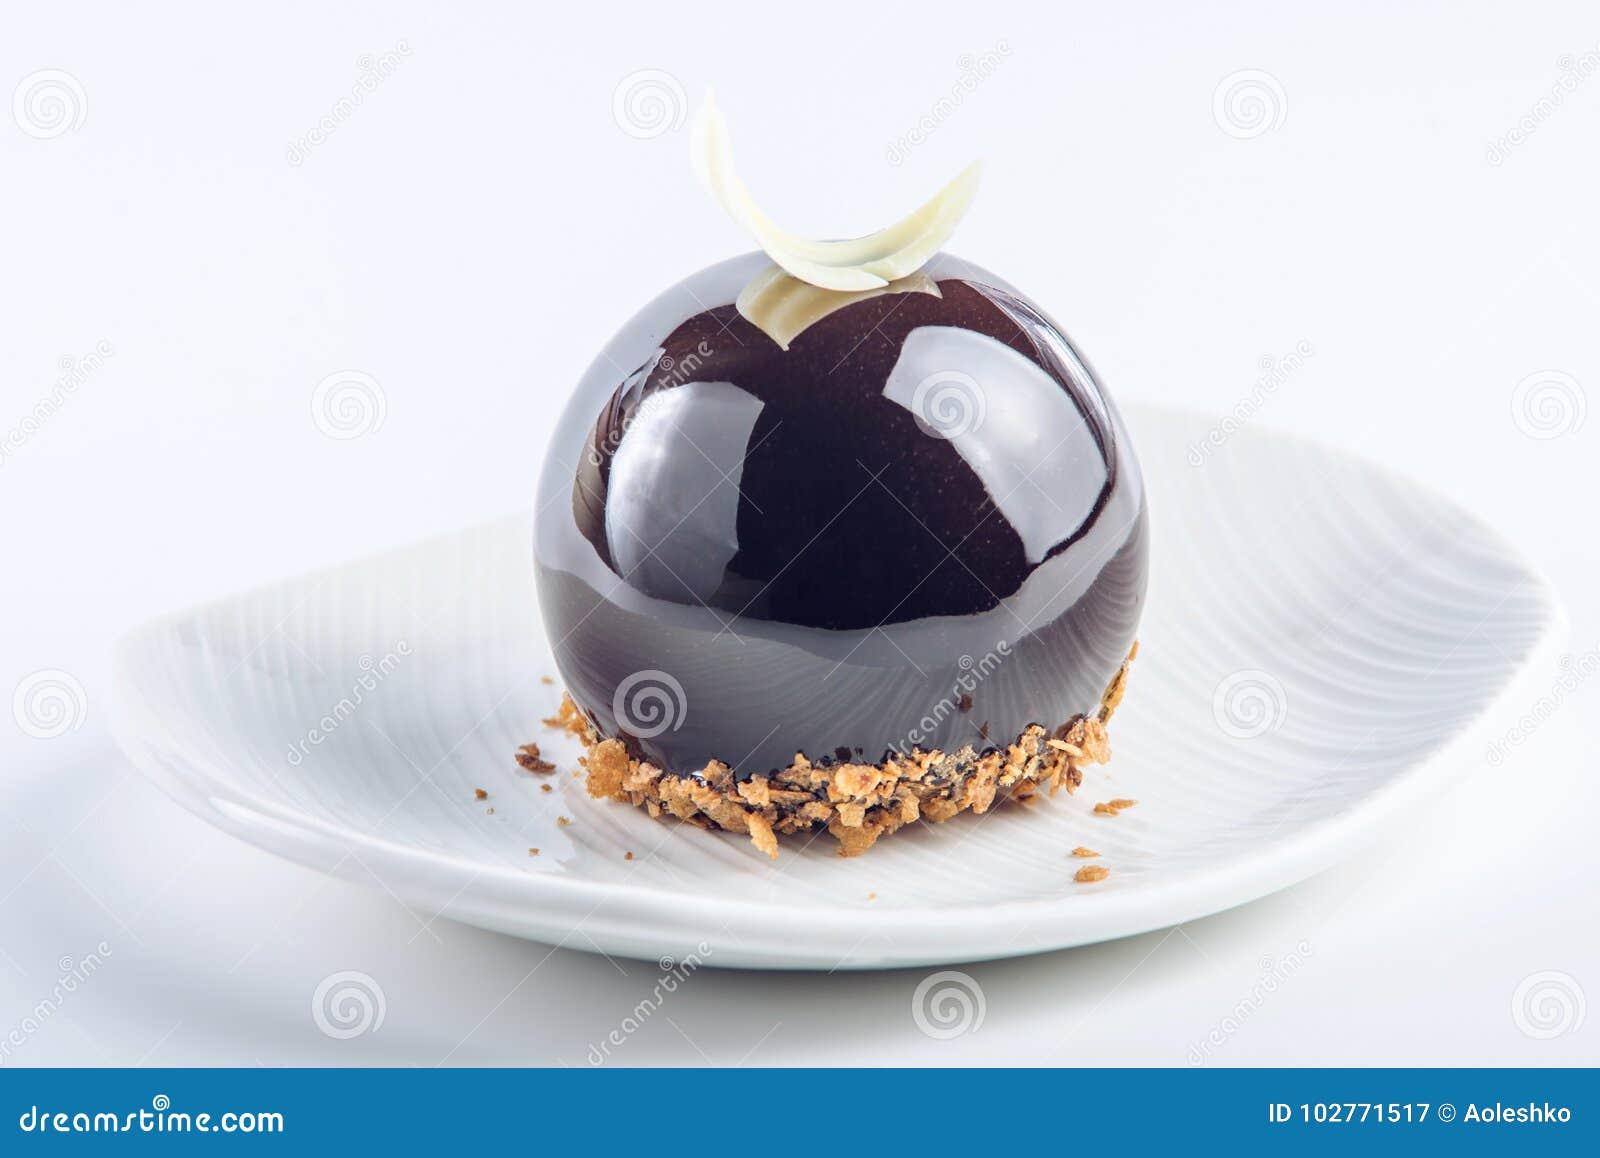 Beautiful Truffle Cake Covered With Glossy Dark Chocolate Glaze